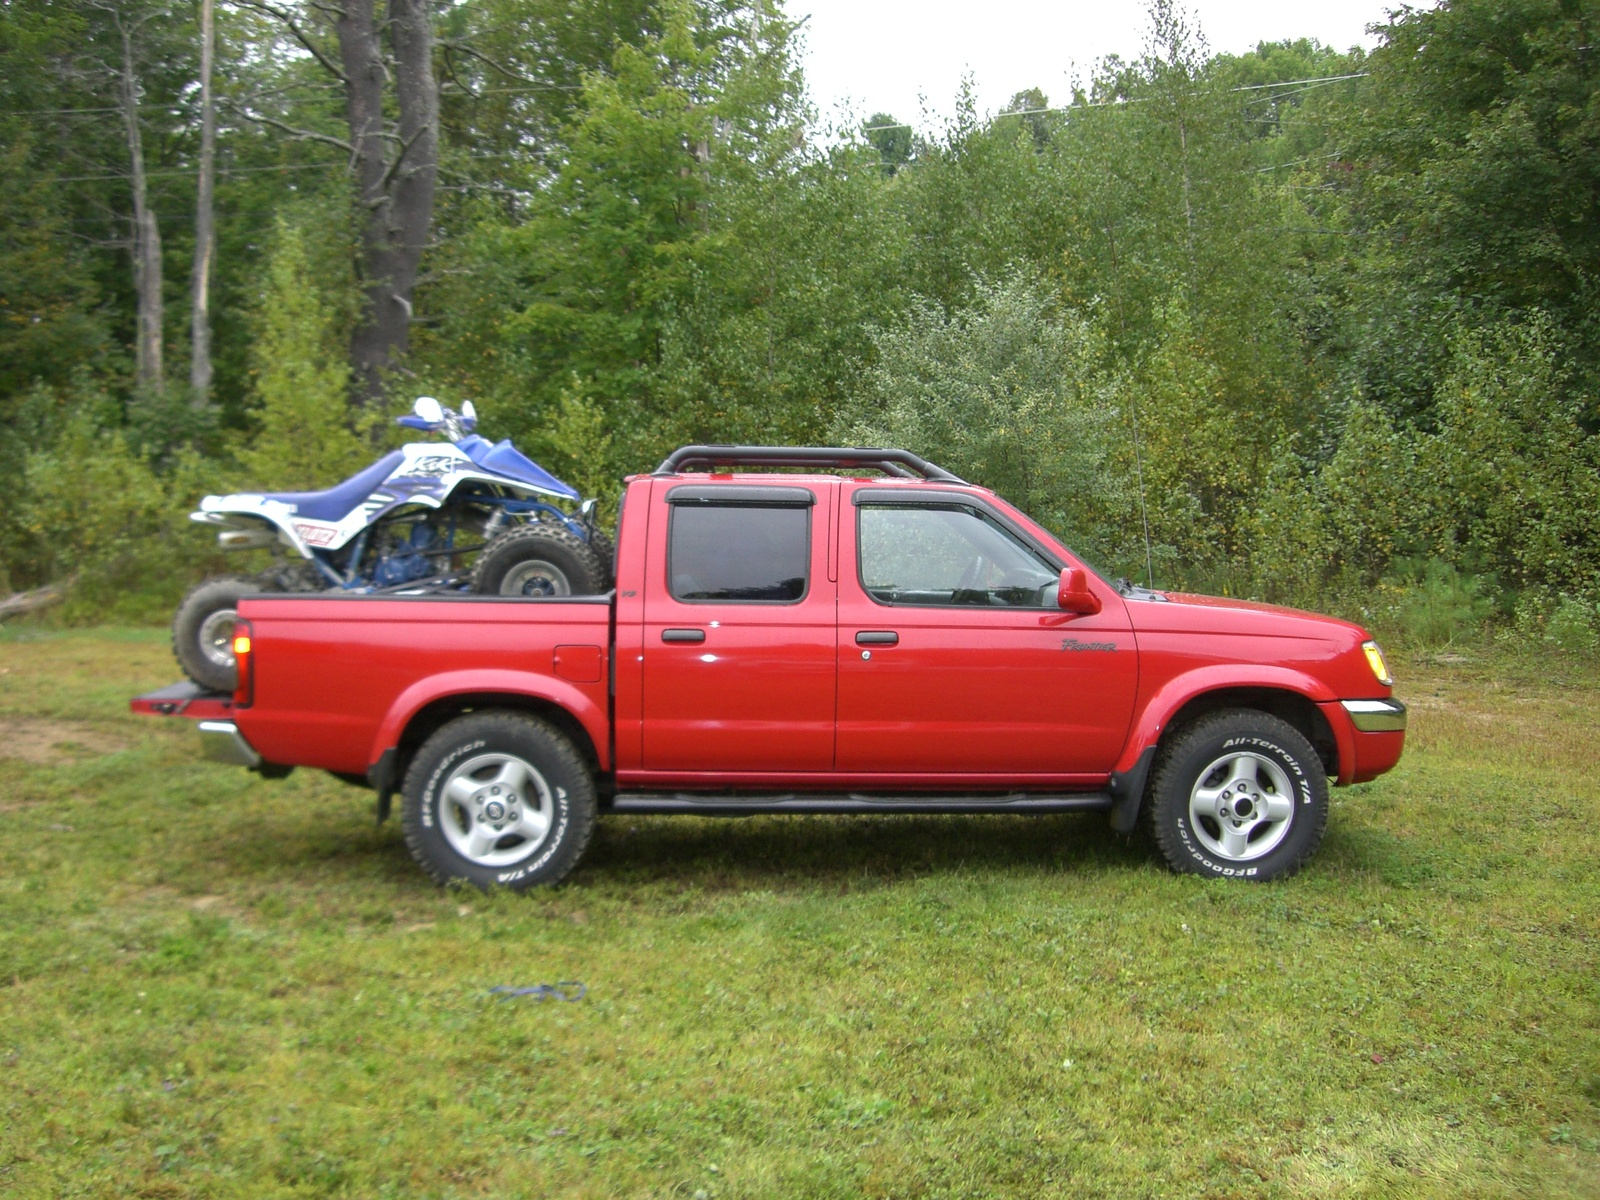 2000 Nissan Frontier Image 10